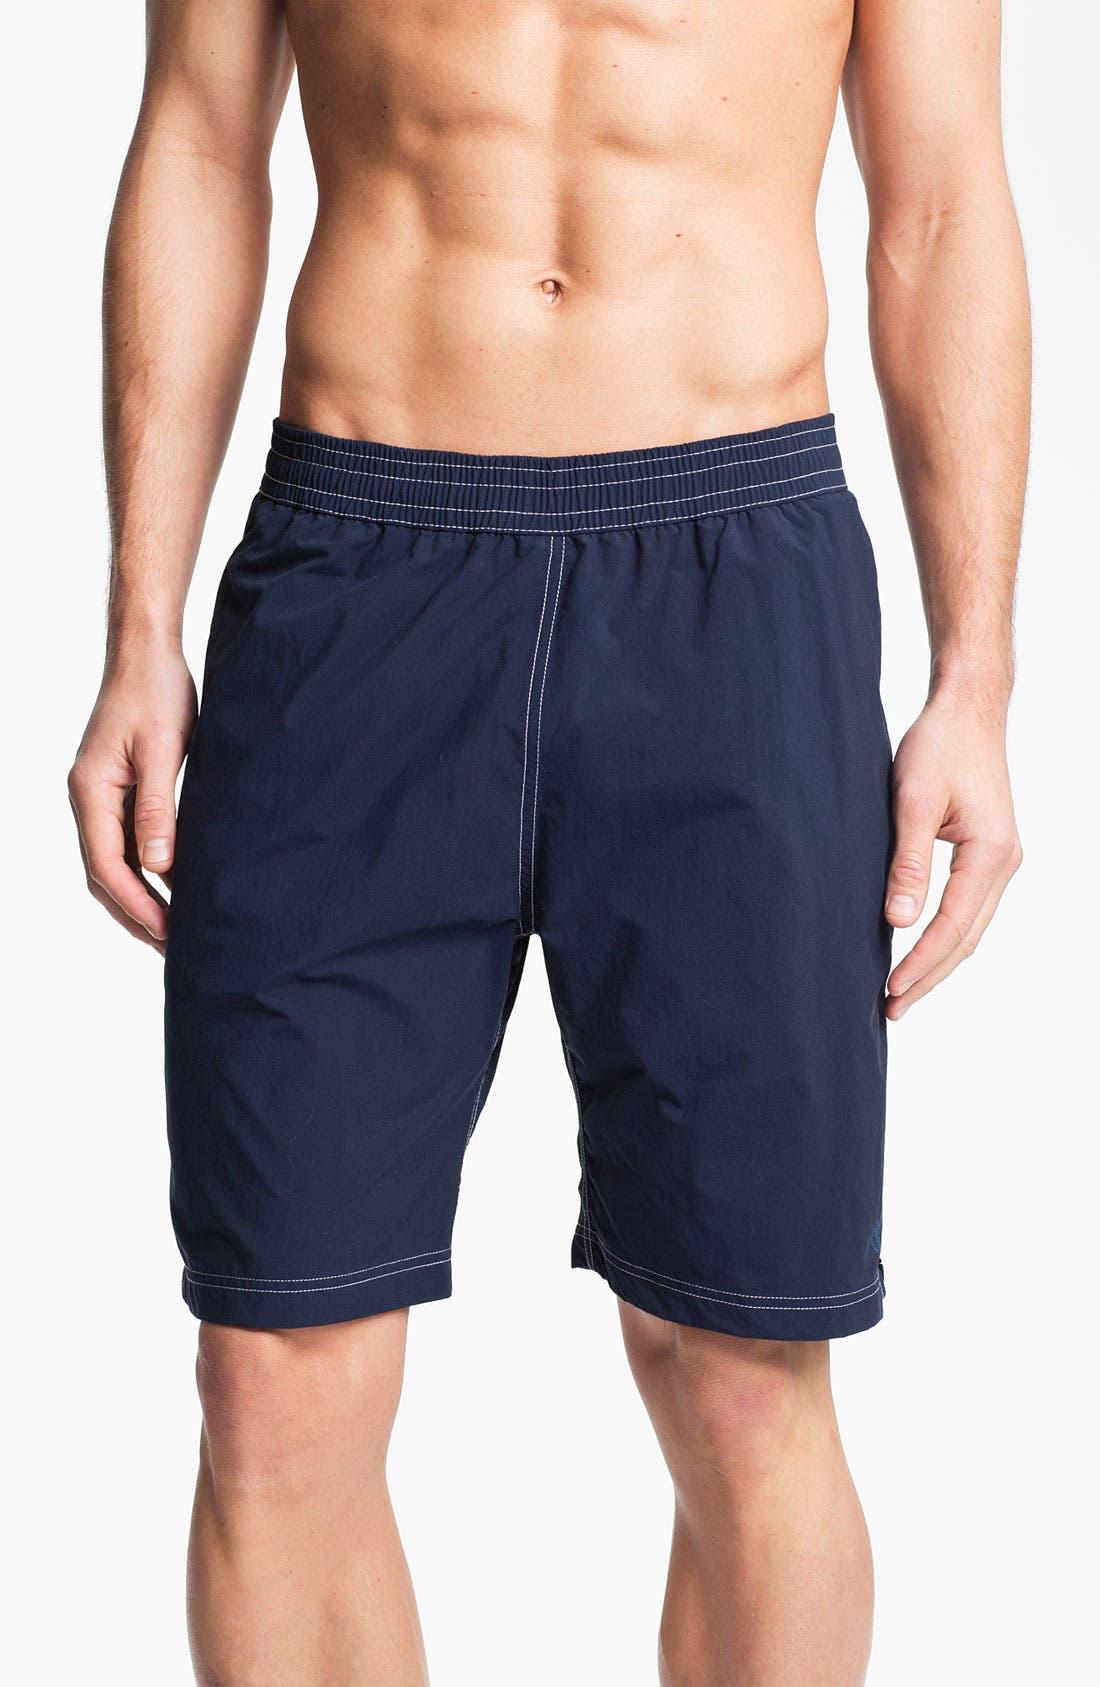 Alternate Image 1 Selected - Maker & Company 'Pukka' Swim Shorts (Online Only)